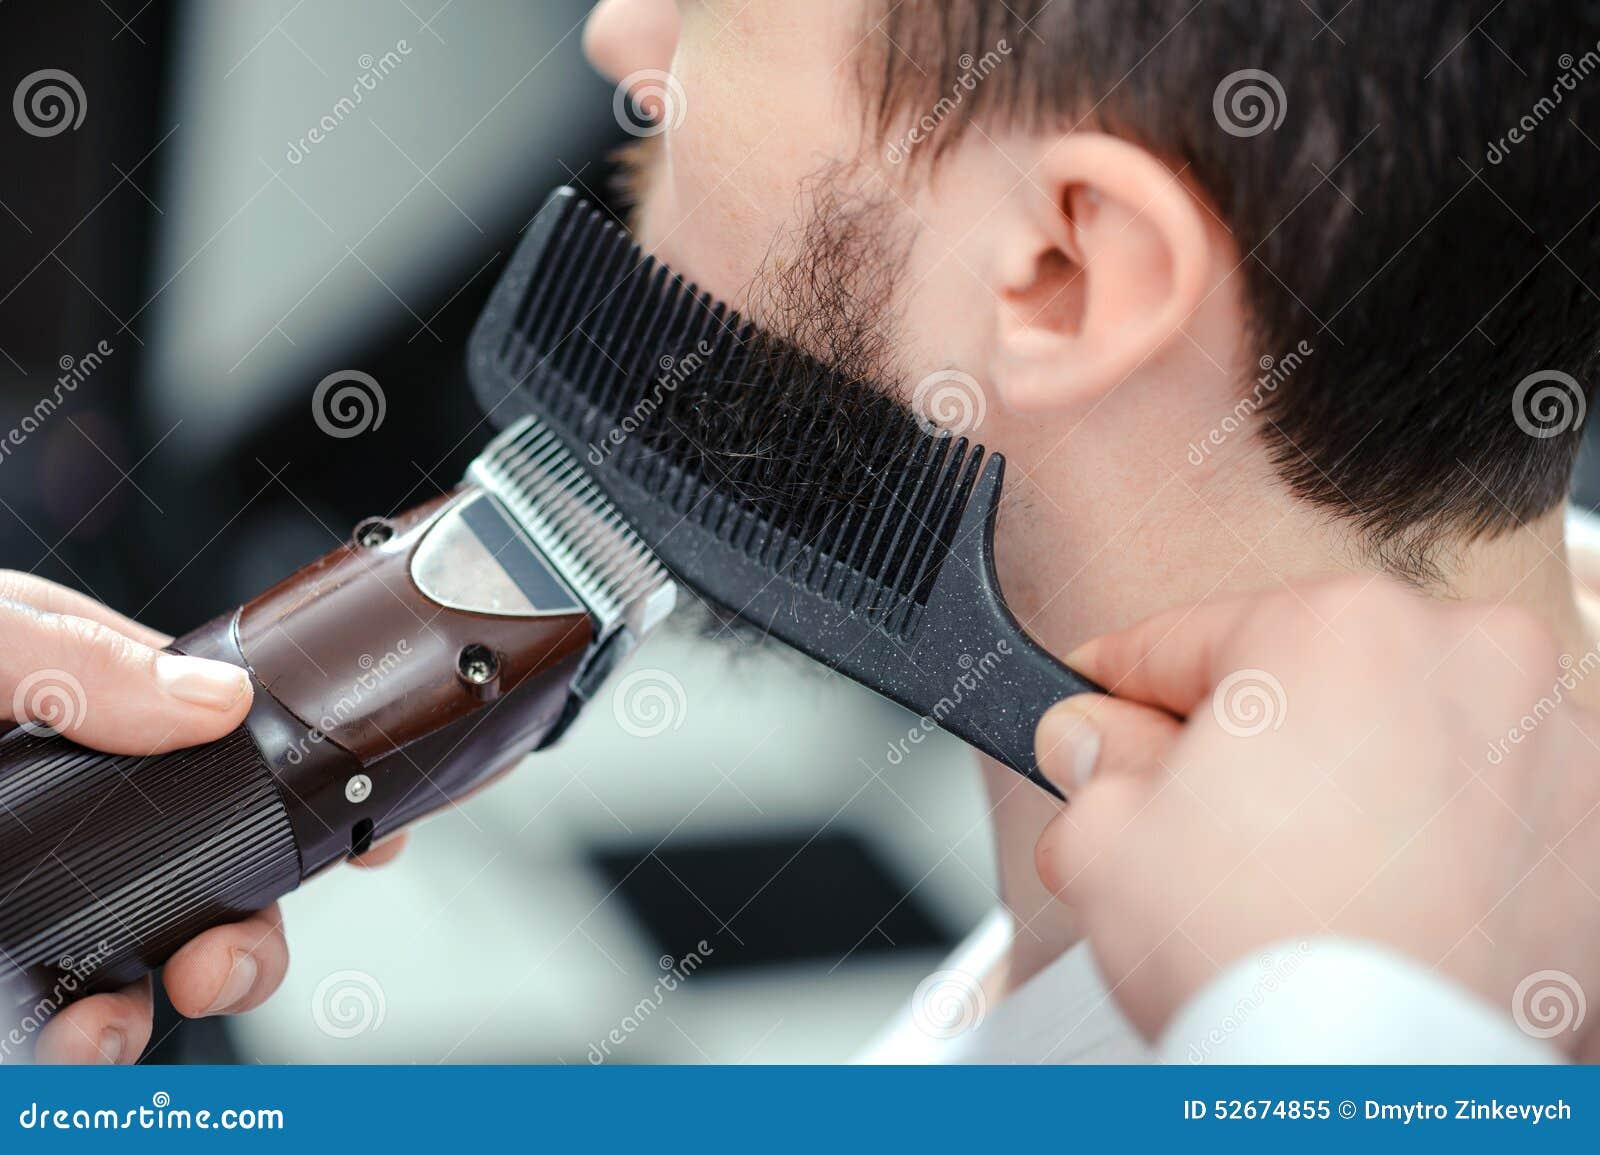 Man shaves his beard with a hair clipper